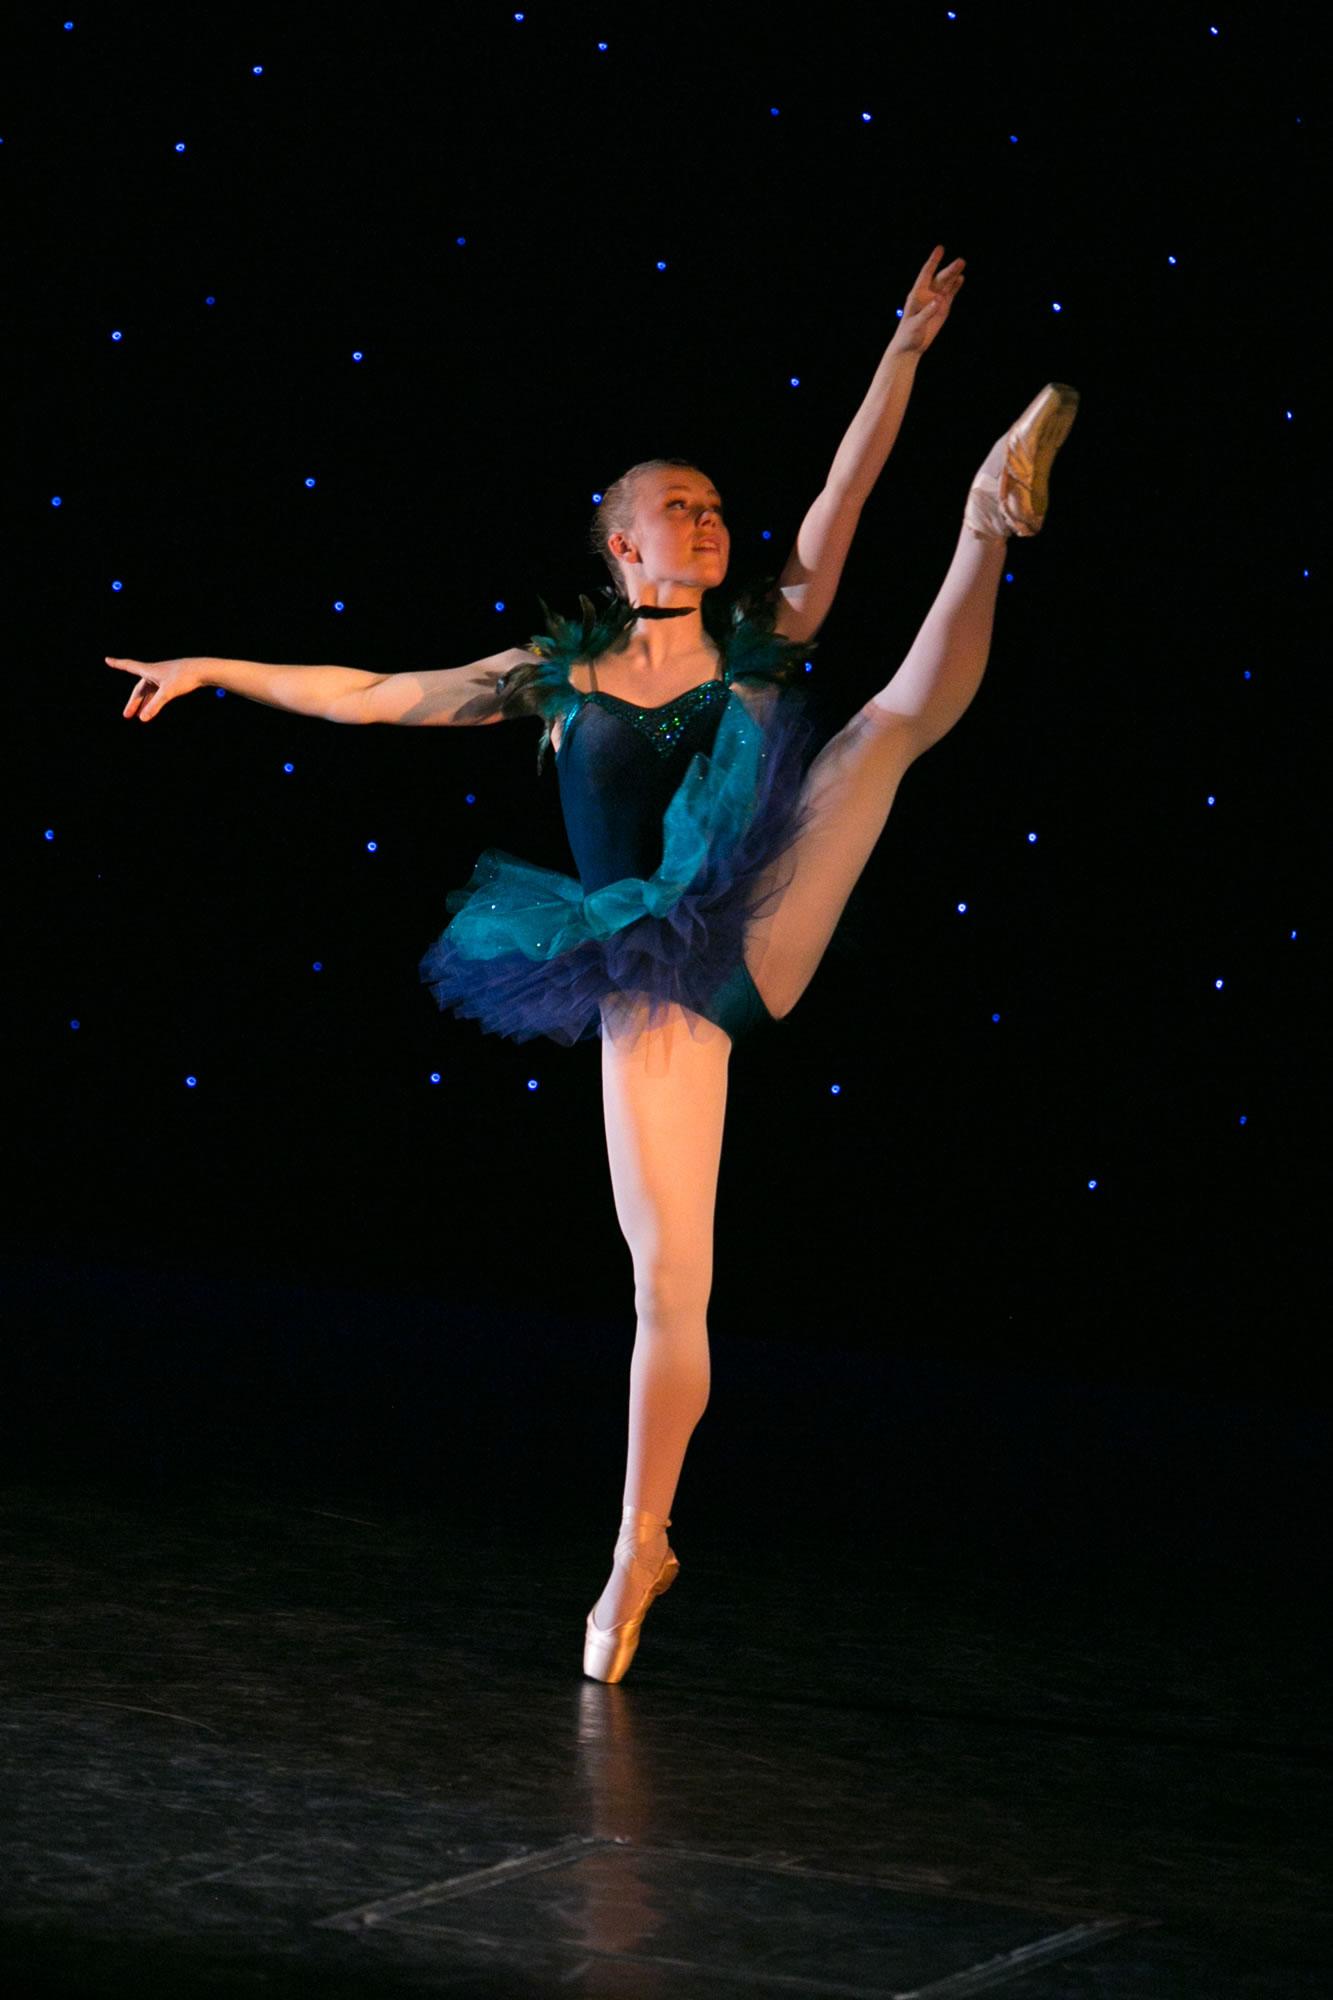 Hitchin_School_of_Dance_Show_2019-SM1_2006.jpg